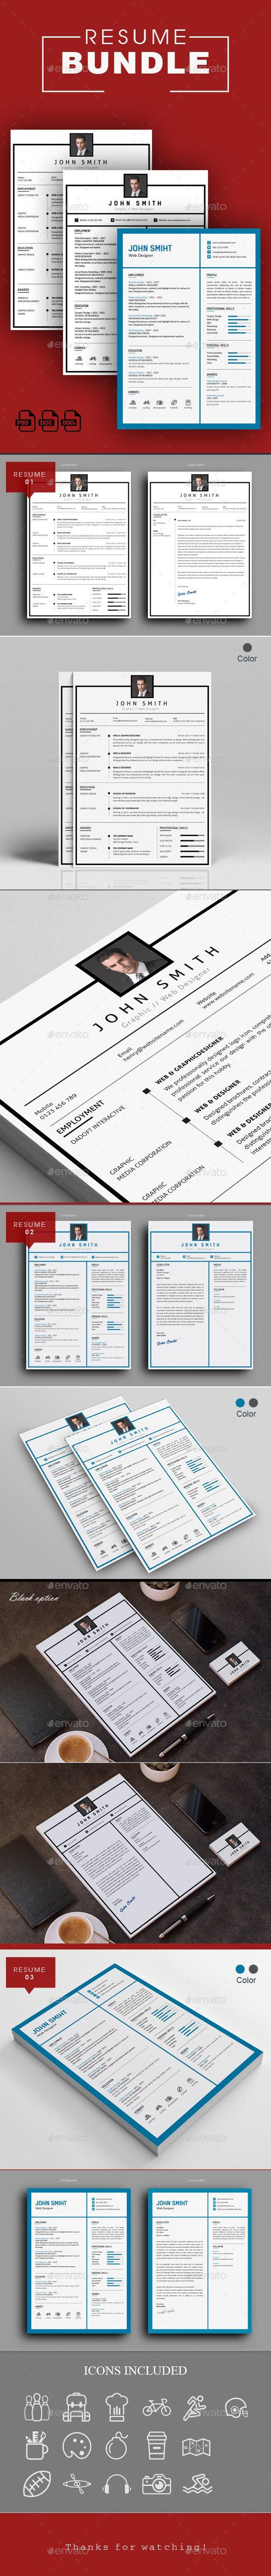 Resume Word Bundle #cv doc #resume set  • Download here → https://graphicriver.net/item/resume-word-bundle/20454251?ref=pxcr